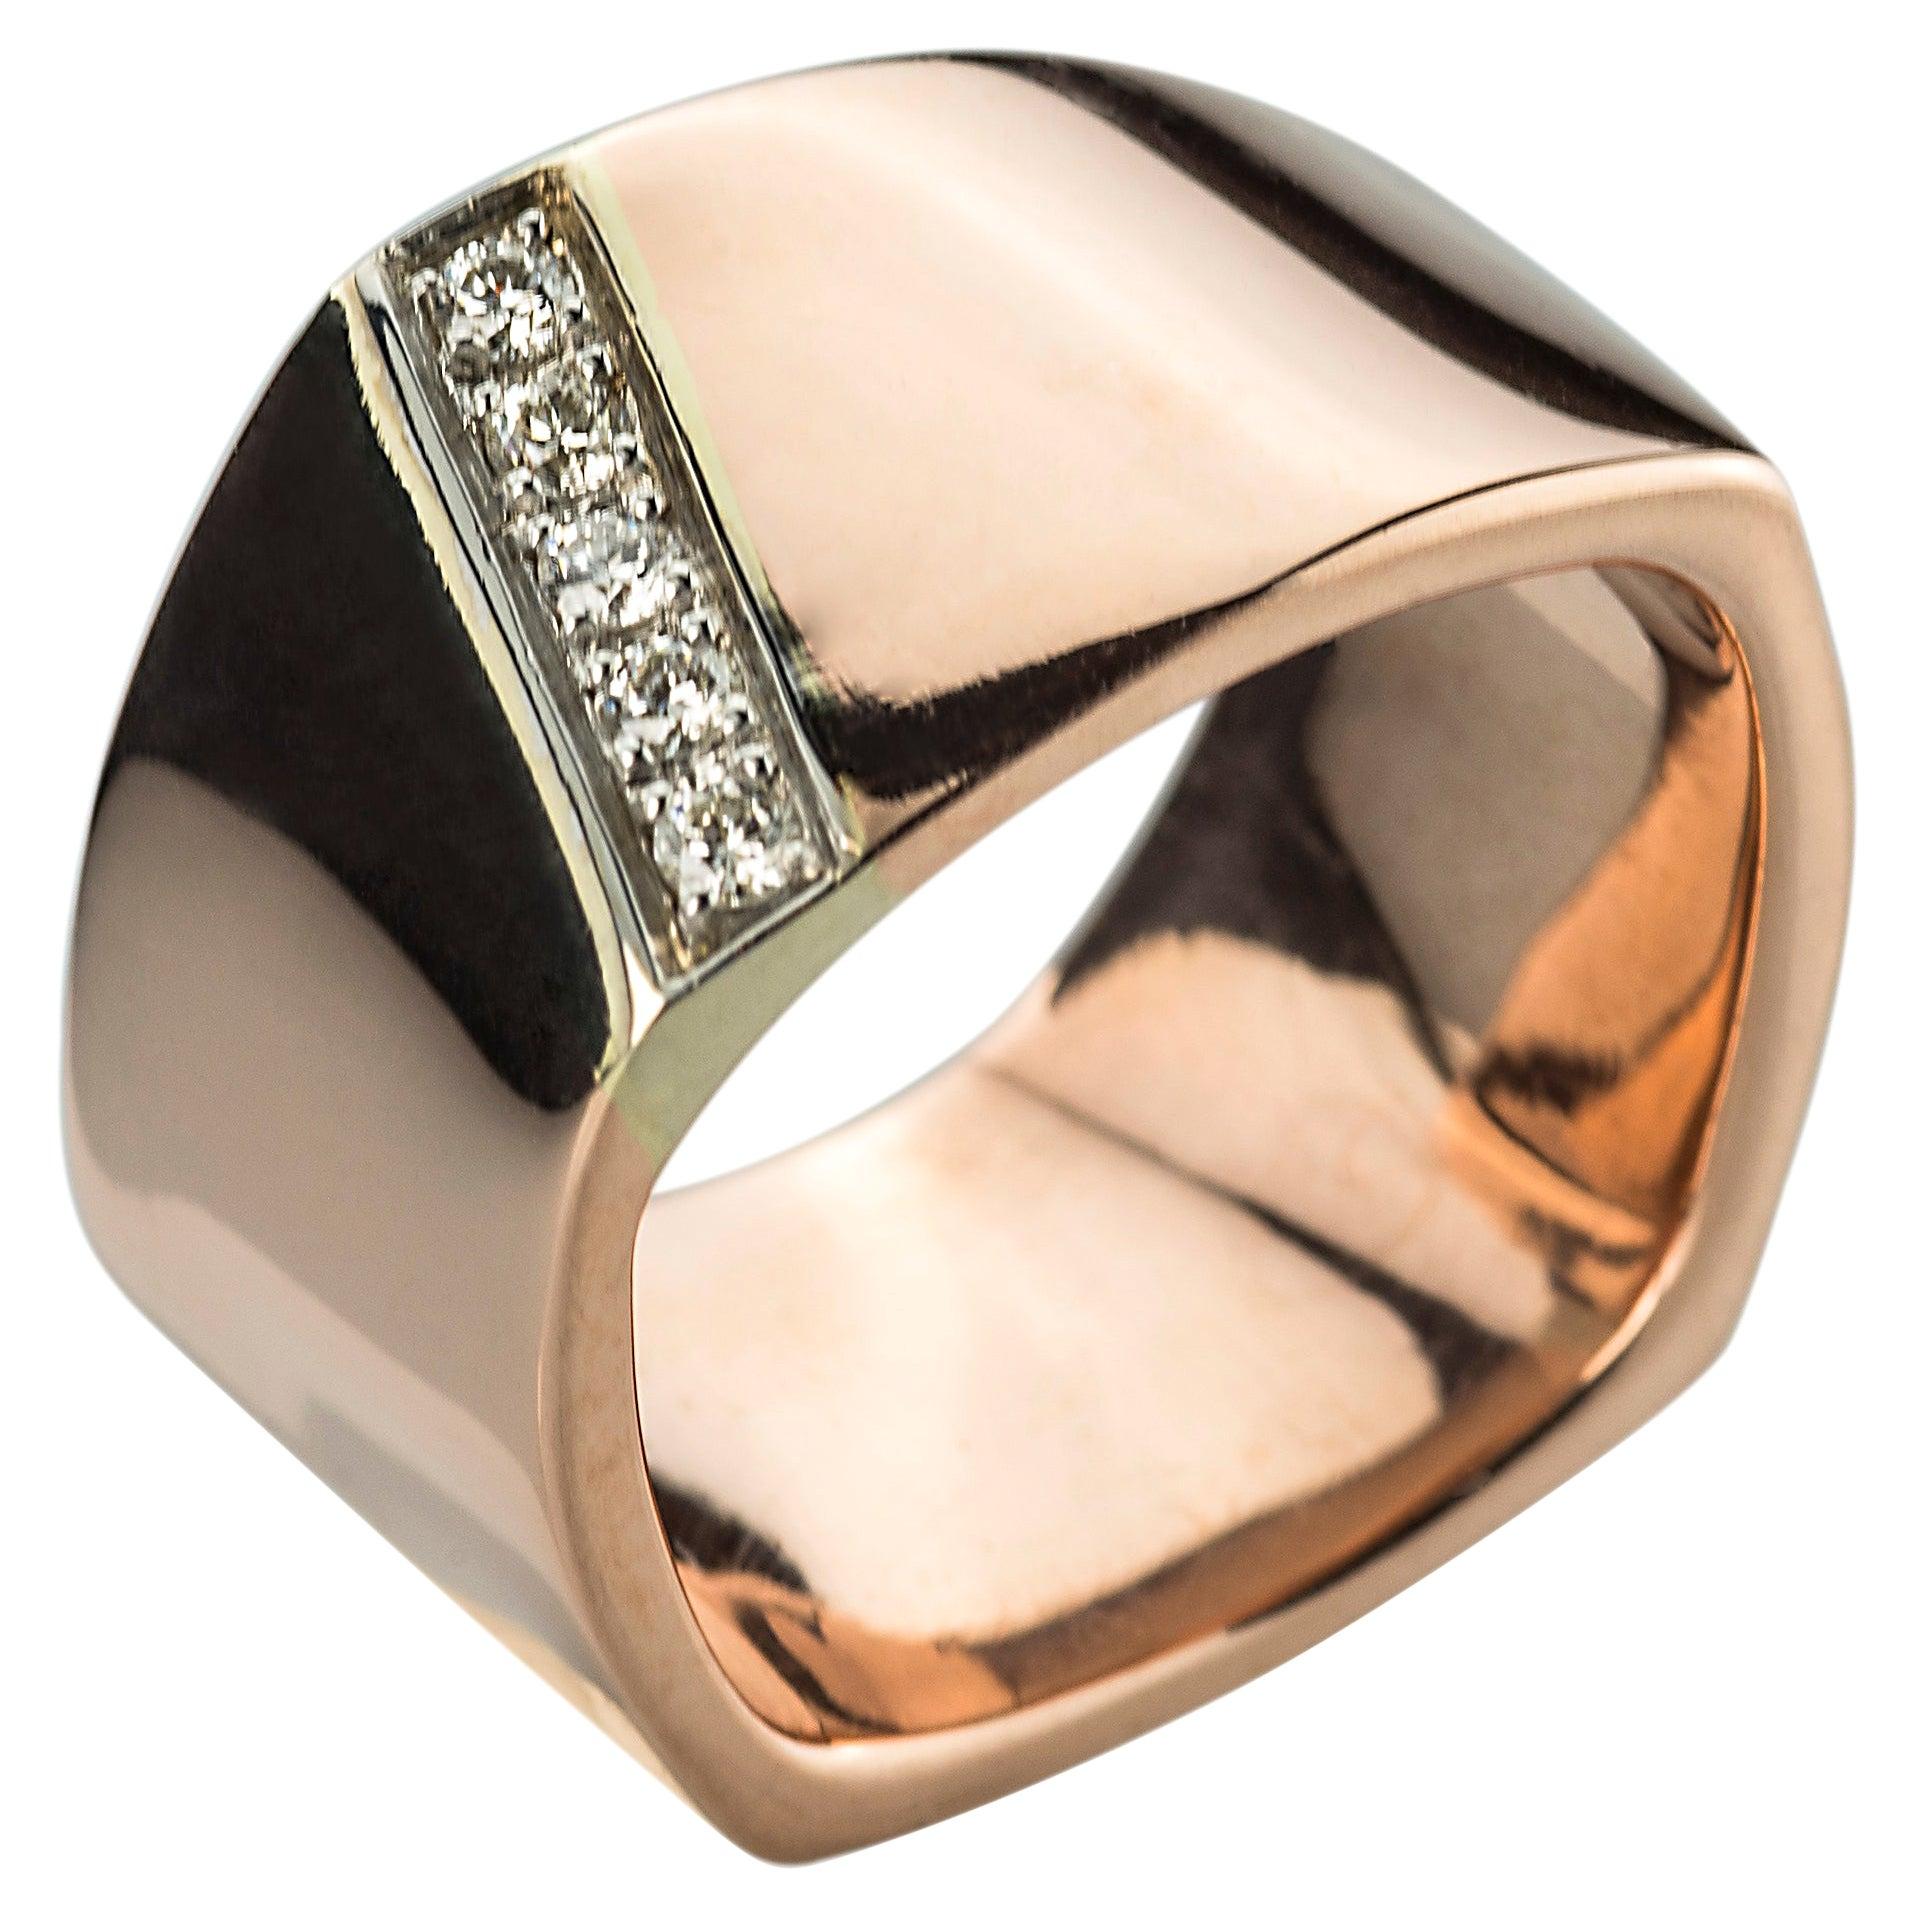 Handcrafted Rose & White Gold 0.20 Karat White Diamonds Design Svevo Band Ring